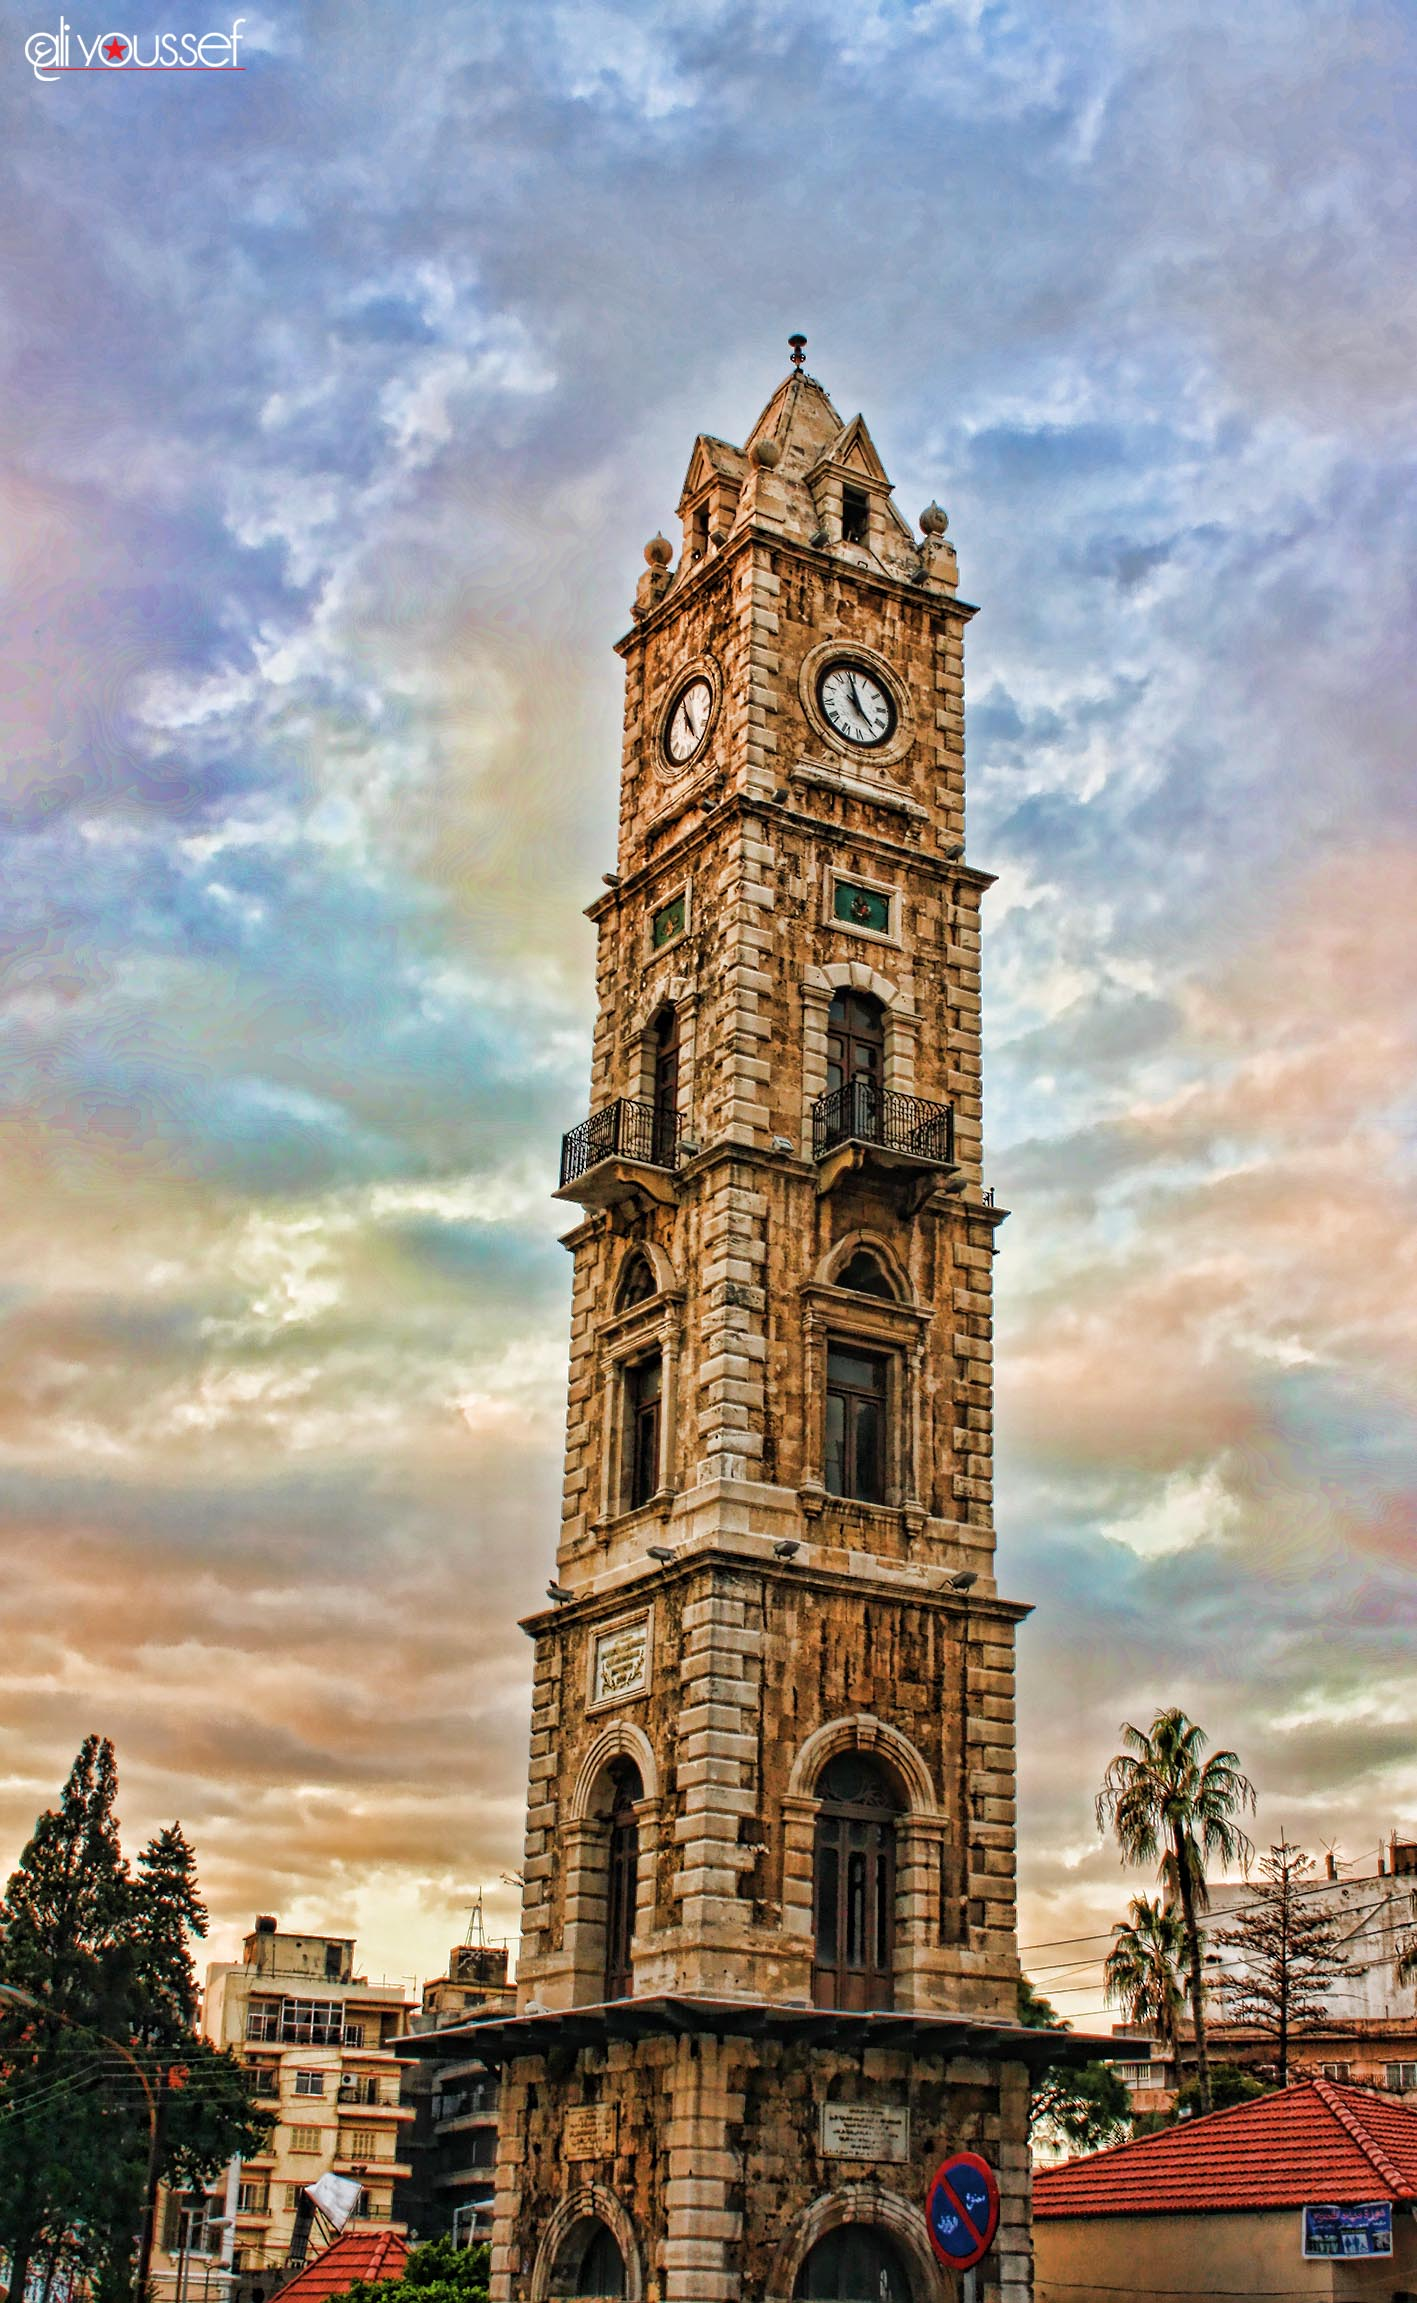 File:Tripoli - Lebanon.jpg - Wikimedia Commons